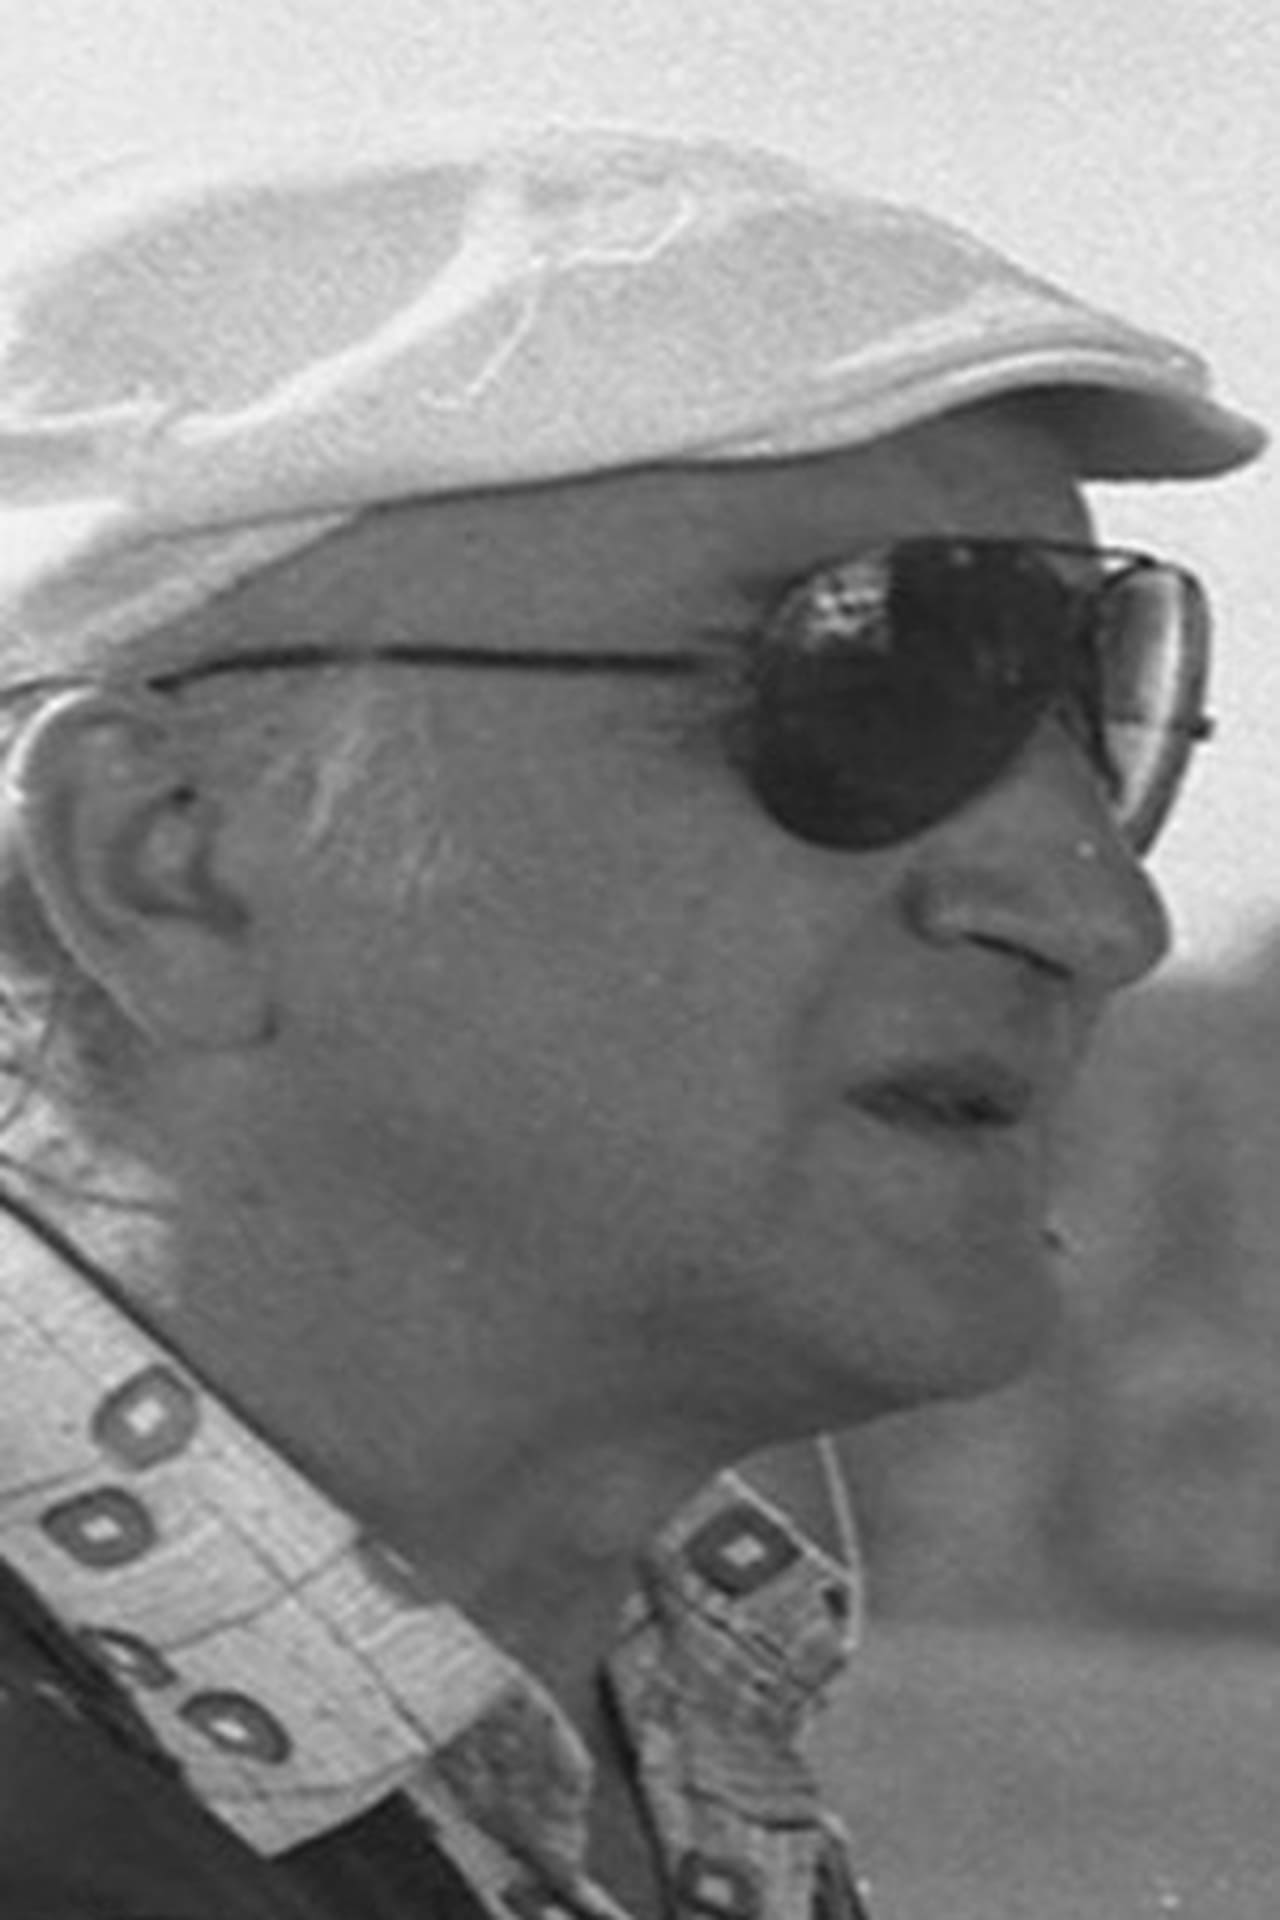 Vitaly Abramov